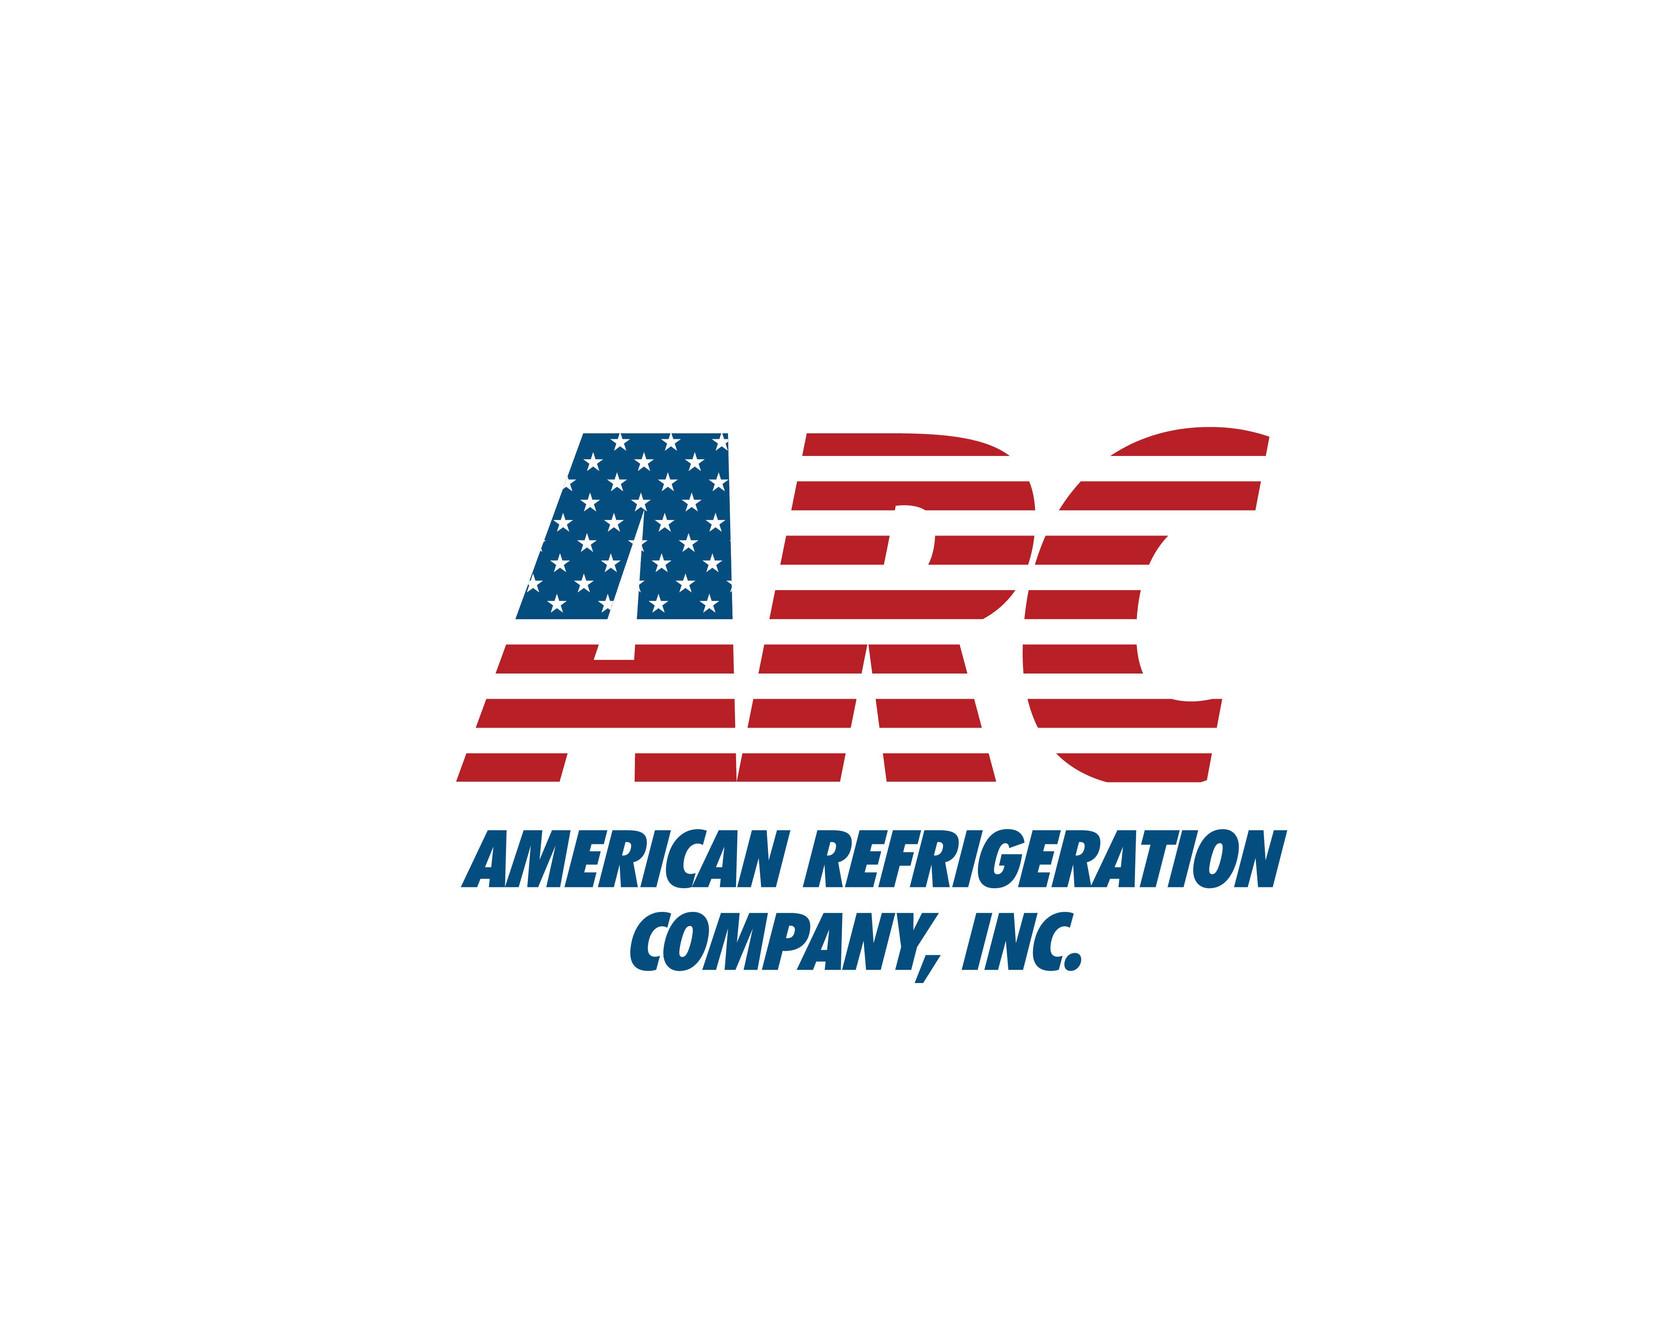 American Refrigeration logo